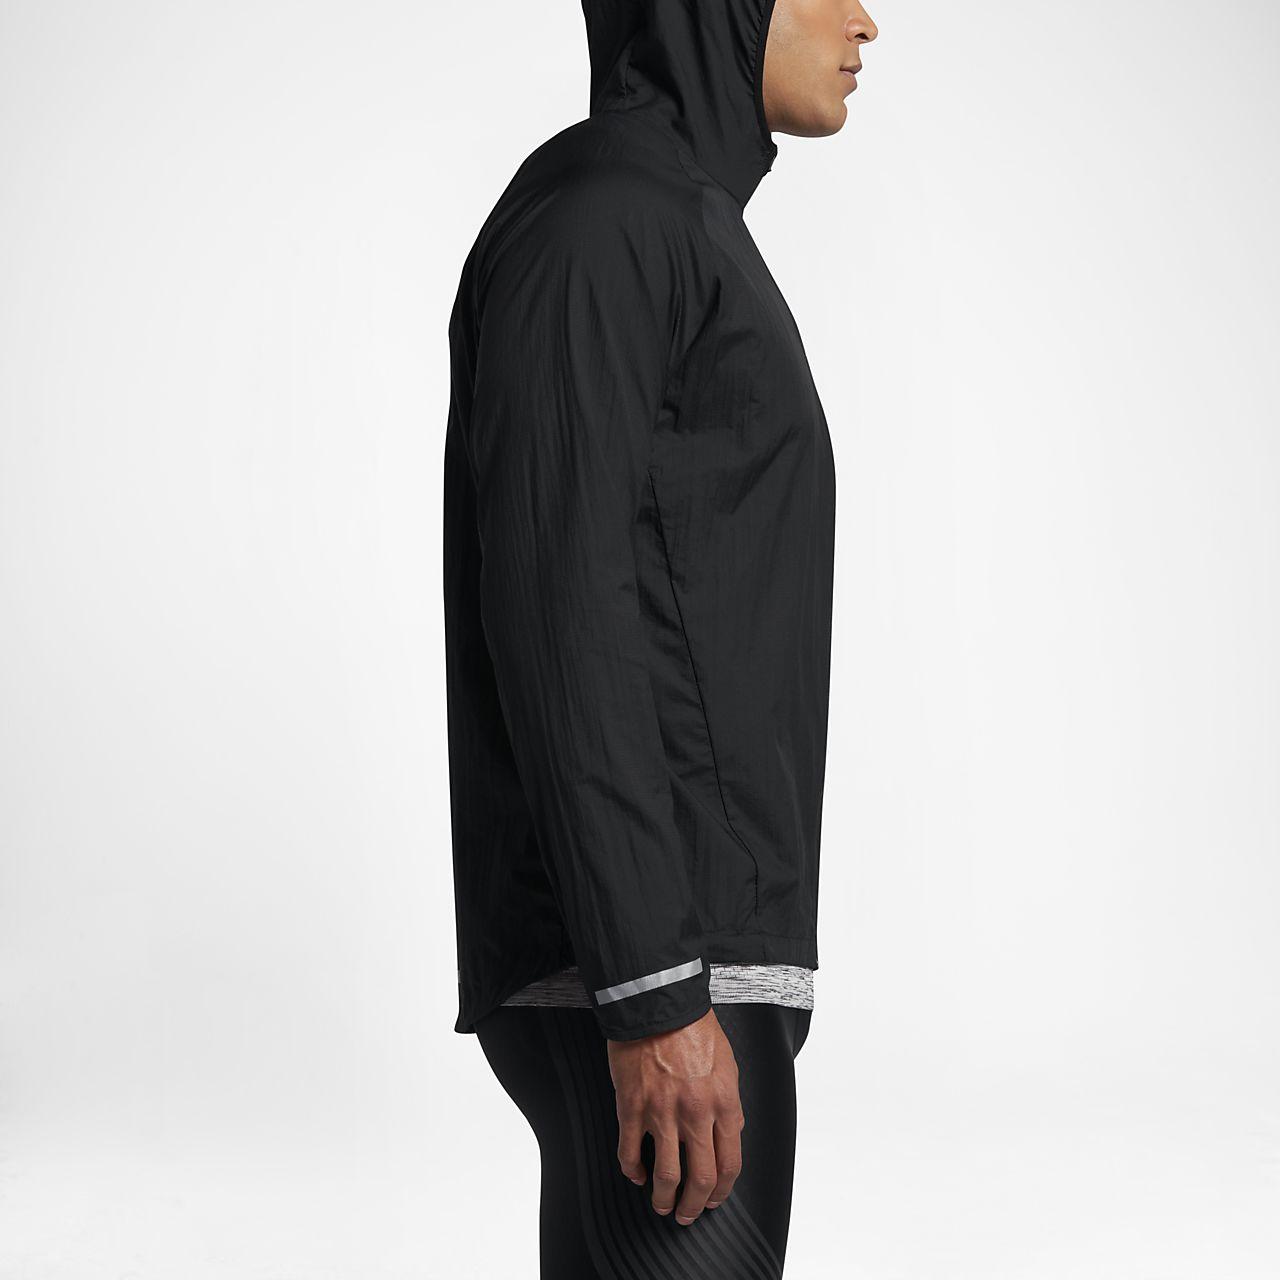 1e9fc29d8378 Nike Impossibly Light Men s Running Jacket. Nike.com IN